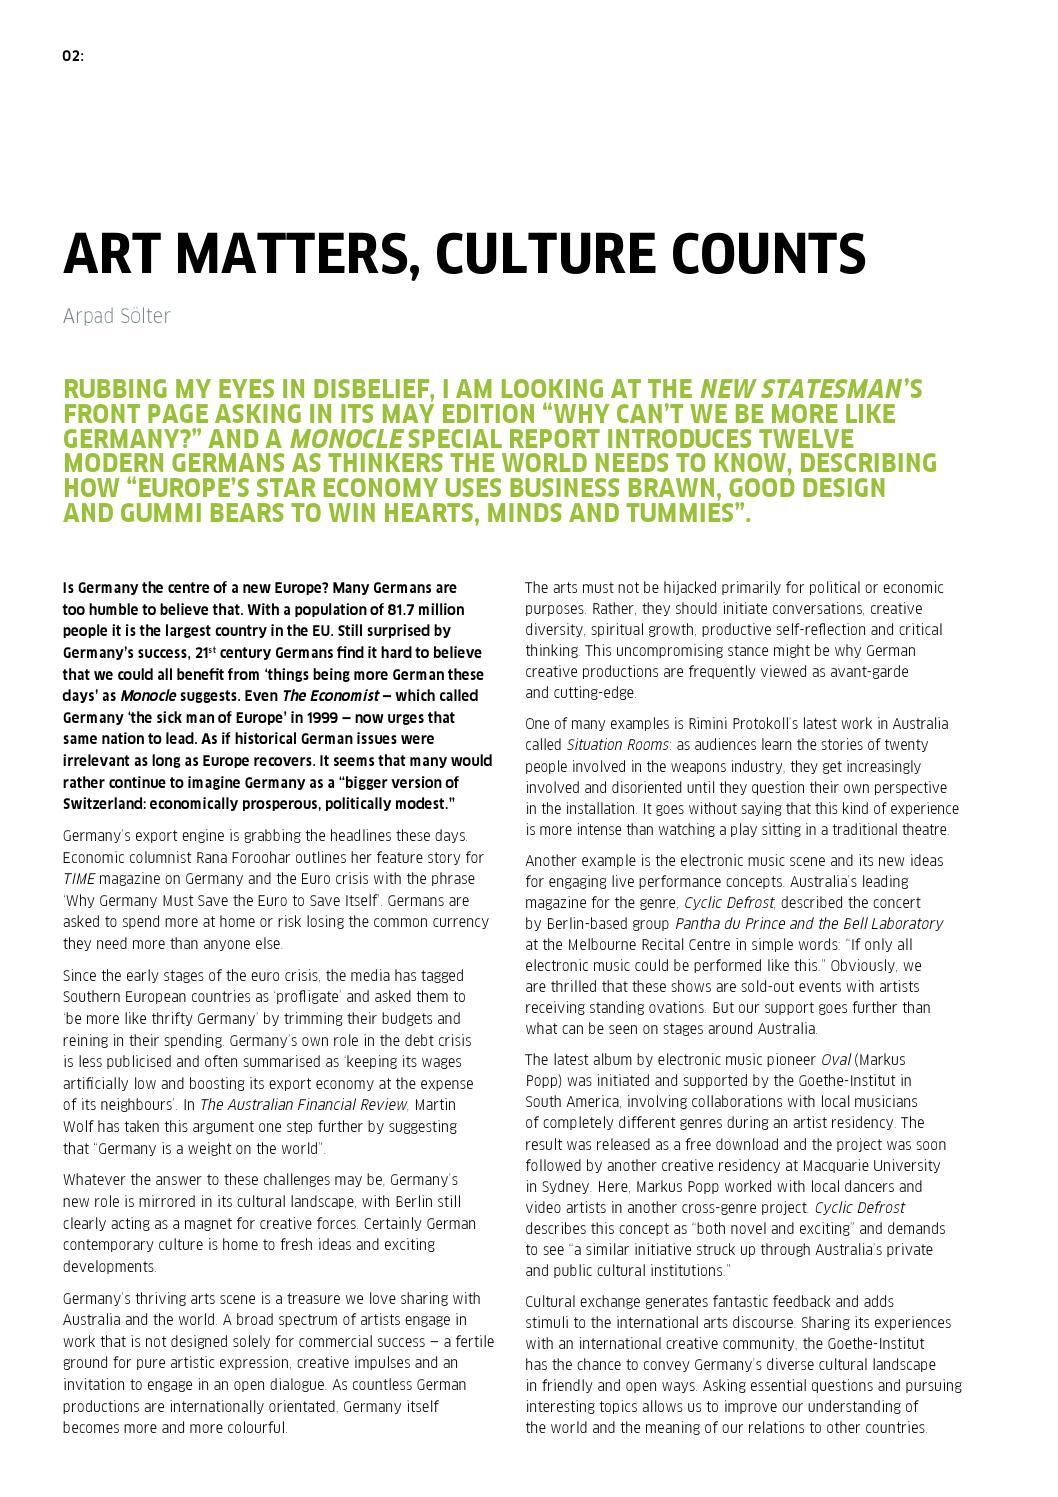 Kultur Magazine 24: 2013 by Goethe-Institut Australia - issuu